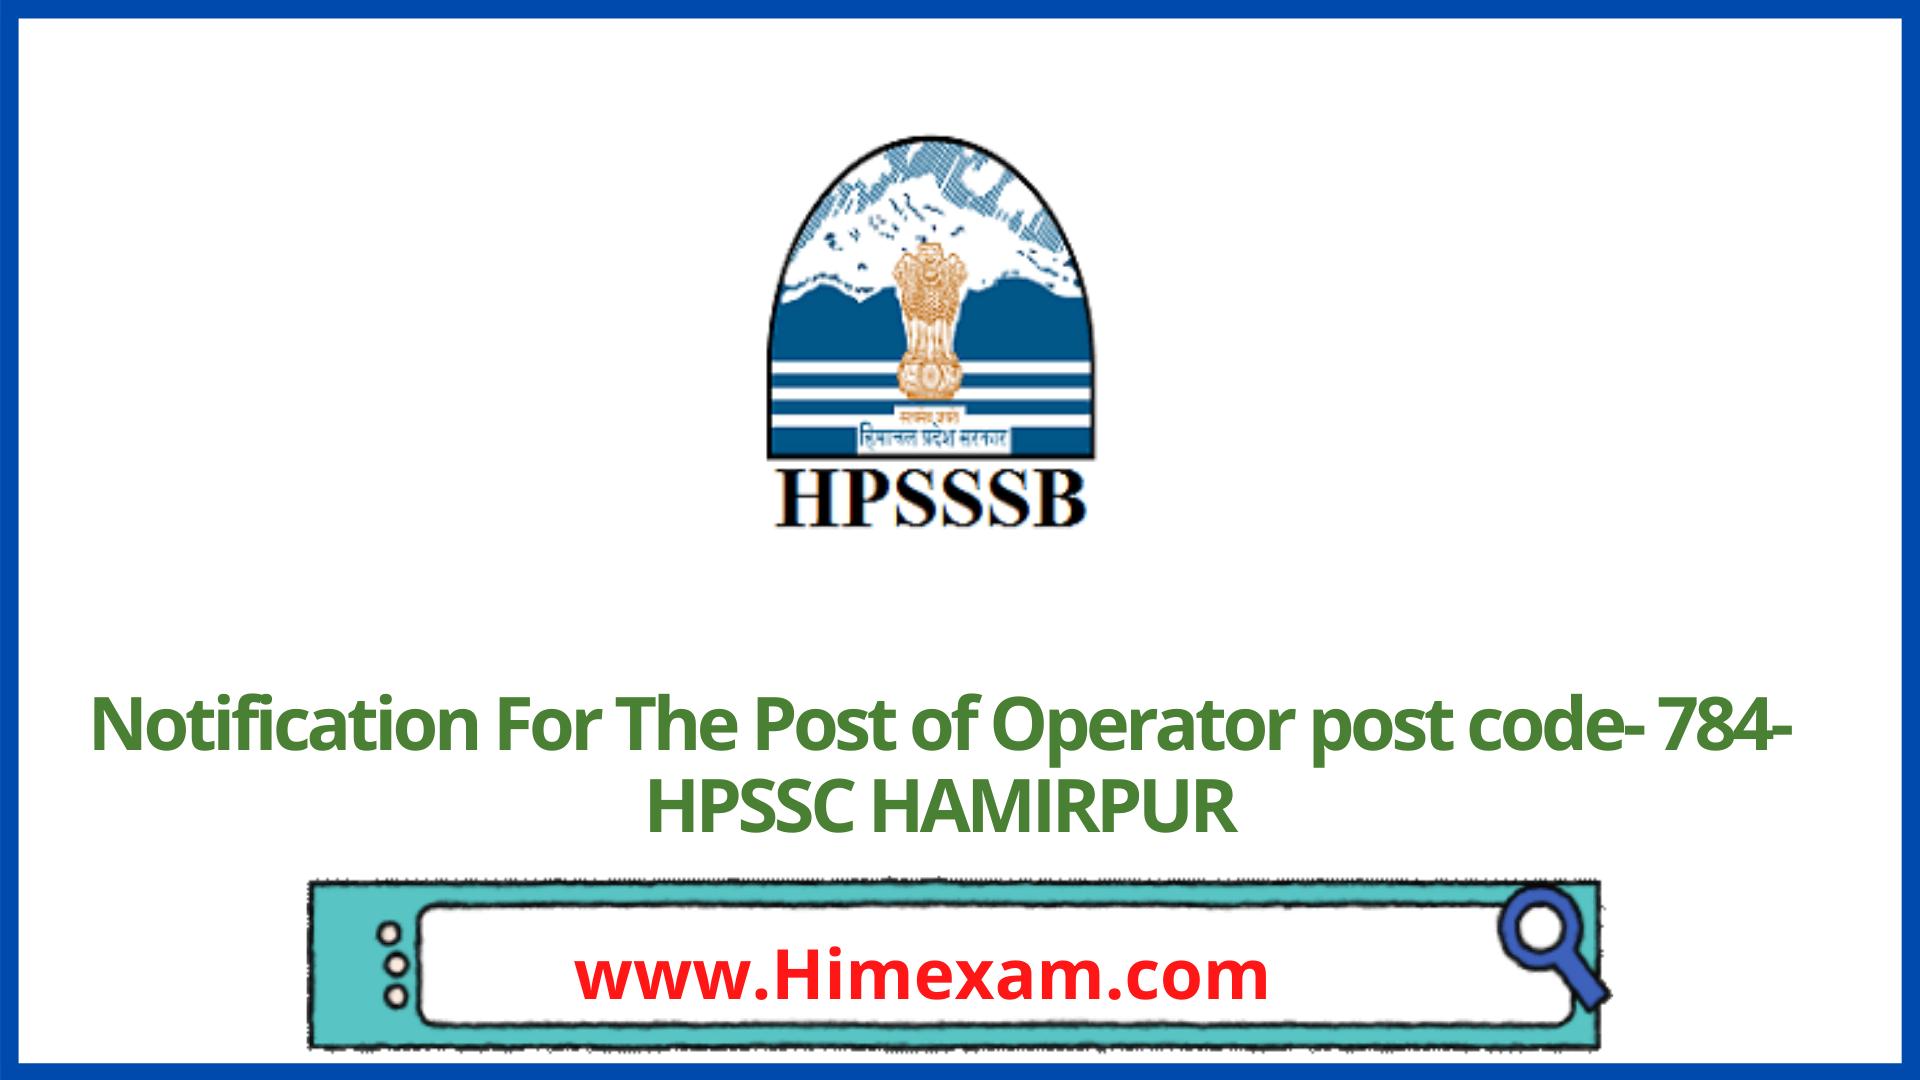 Notification For The Post of Operator post code- 784-HPSSC HAMIRPUR